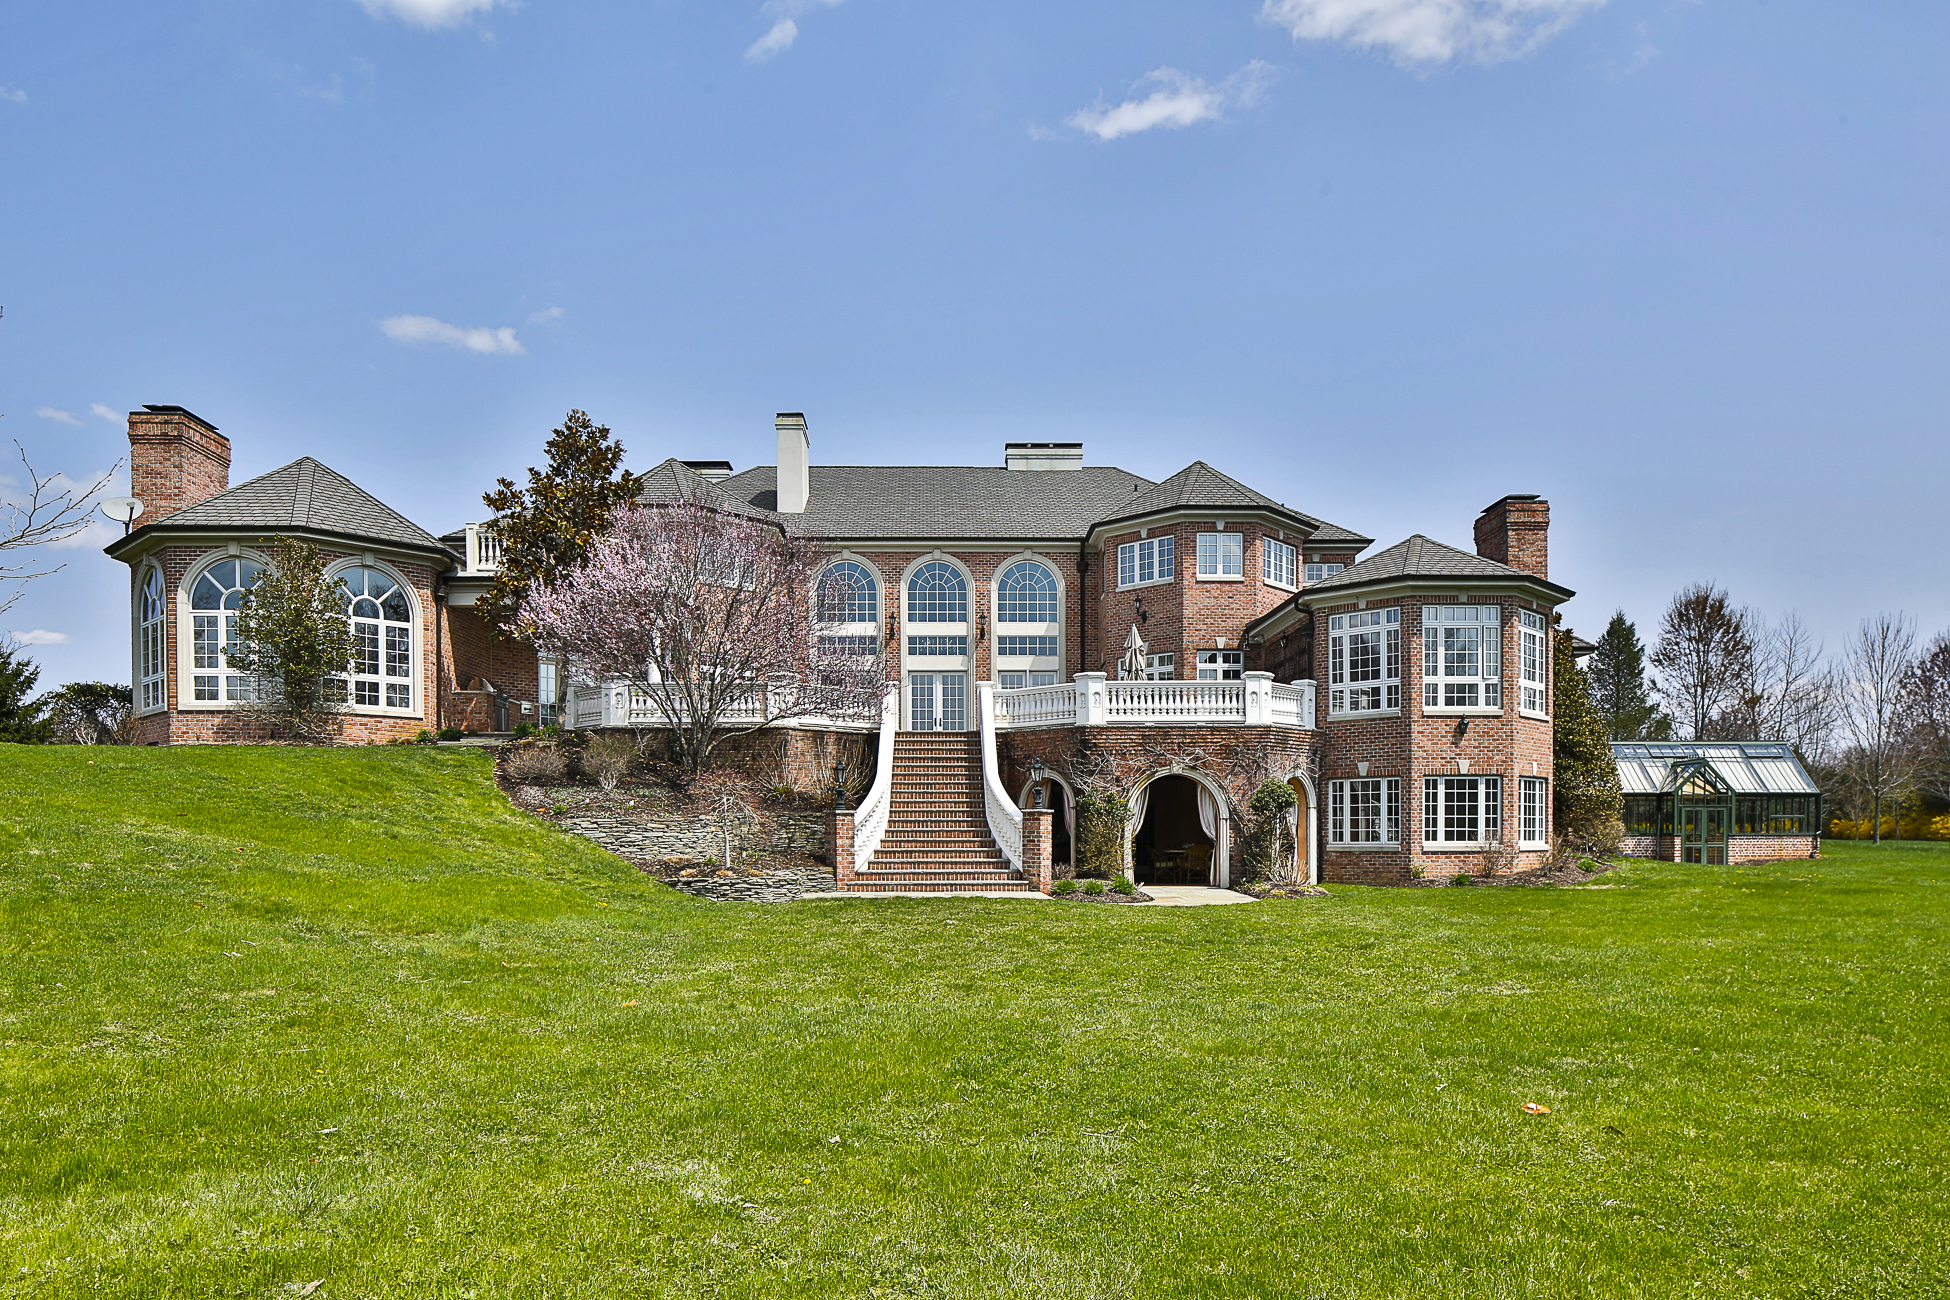 独户住宅 为 销售 在 Inspired Elegance - Montgomery Township 1014 Cherry Hill Road Princeton, 新泽西州 08540 美国